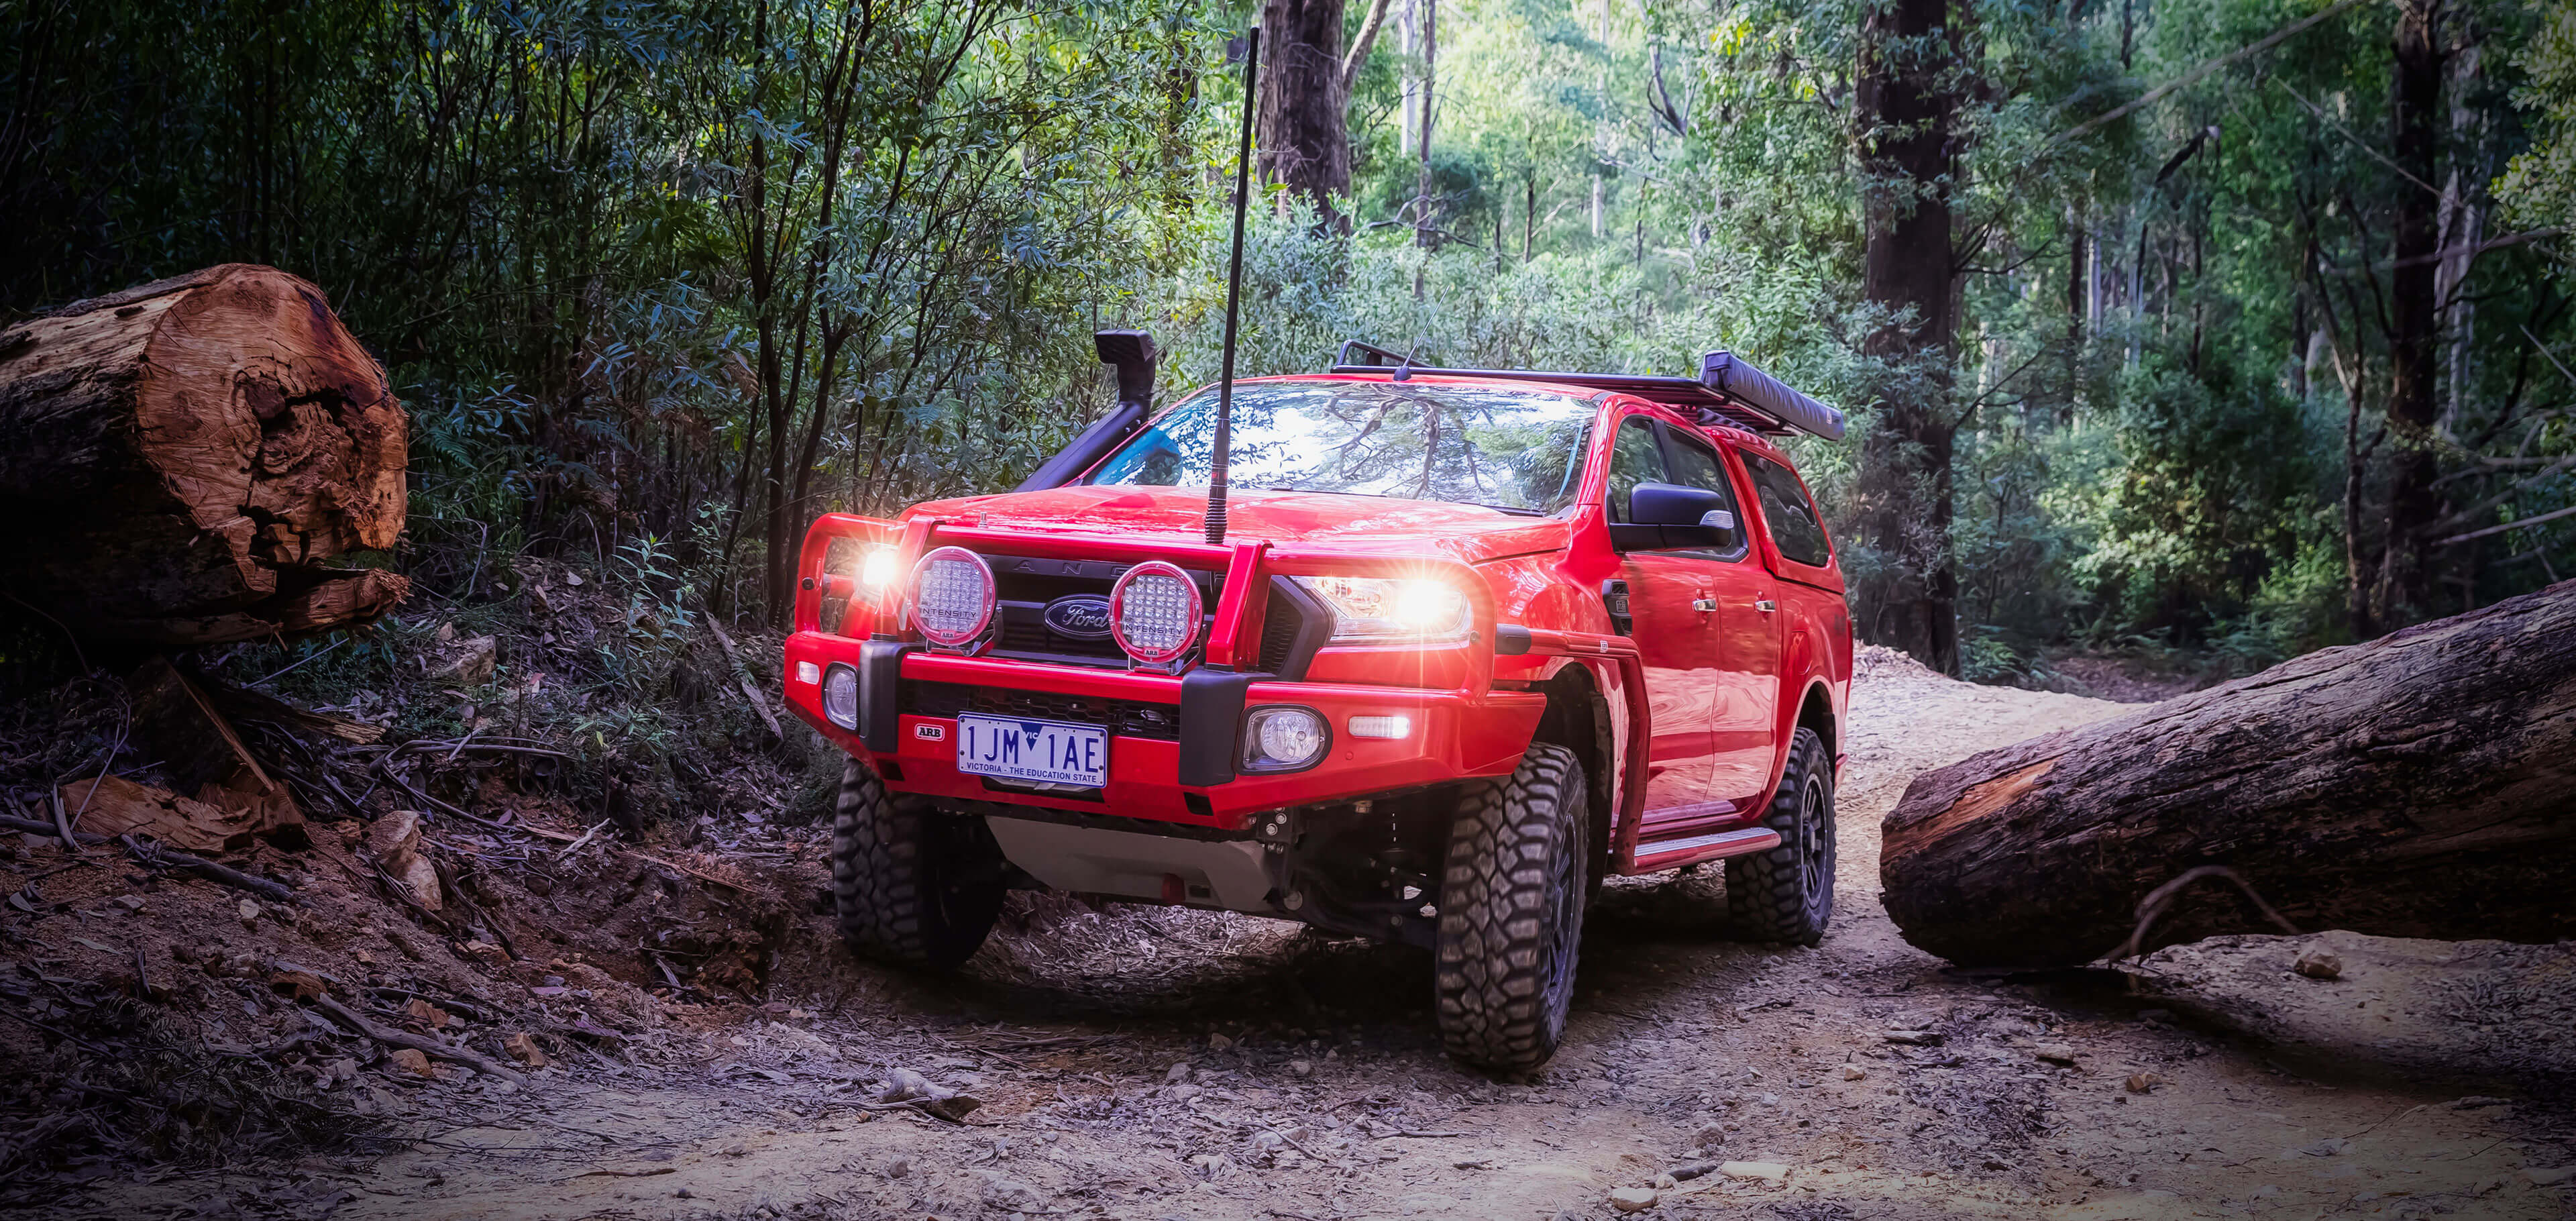 Arb 44 Accessories Fuel Filter Location In 2008 Mazda 6 Explore